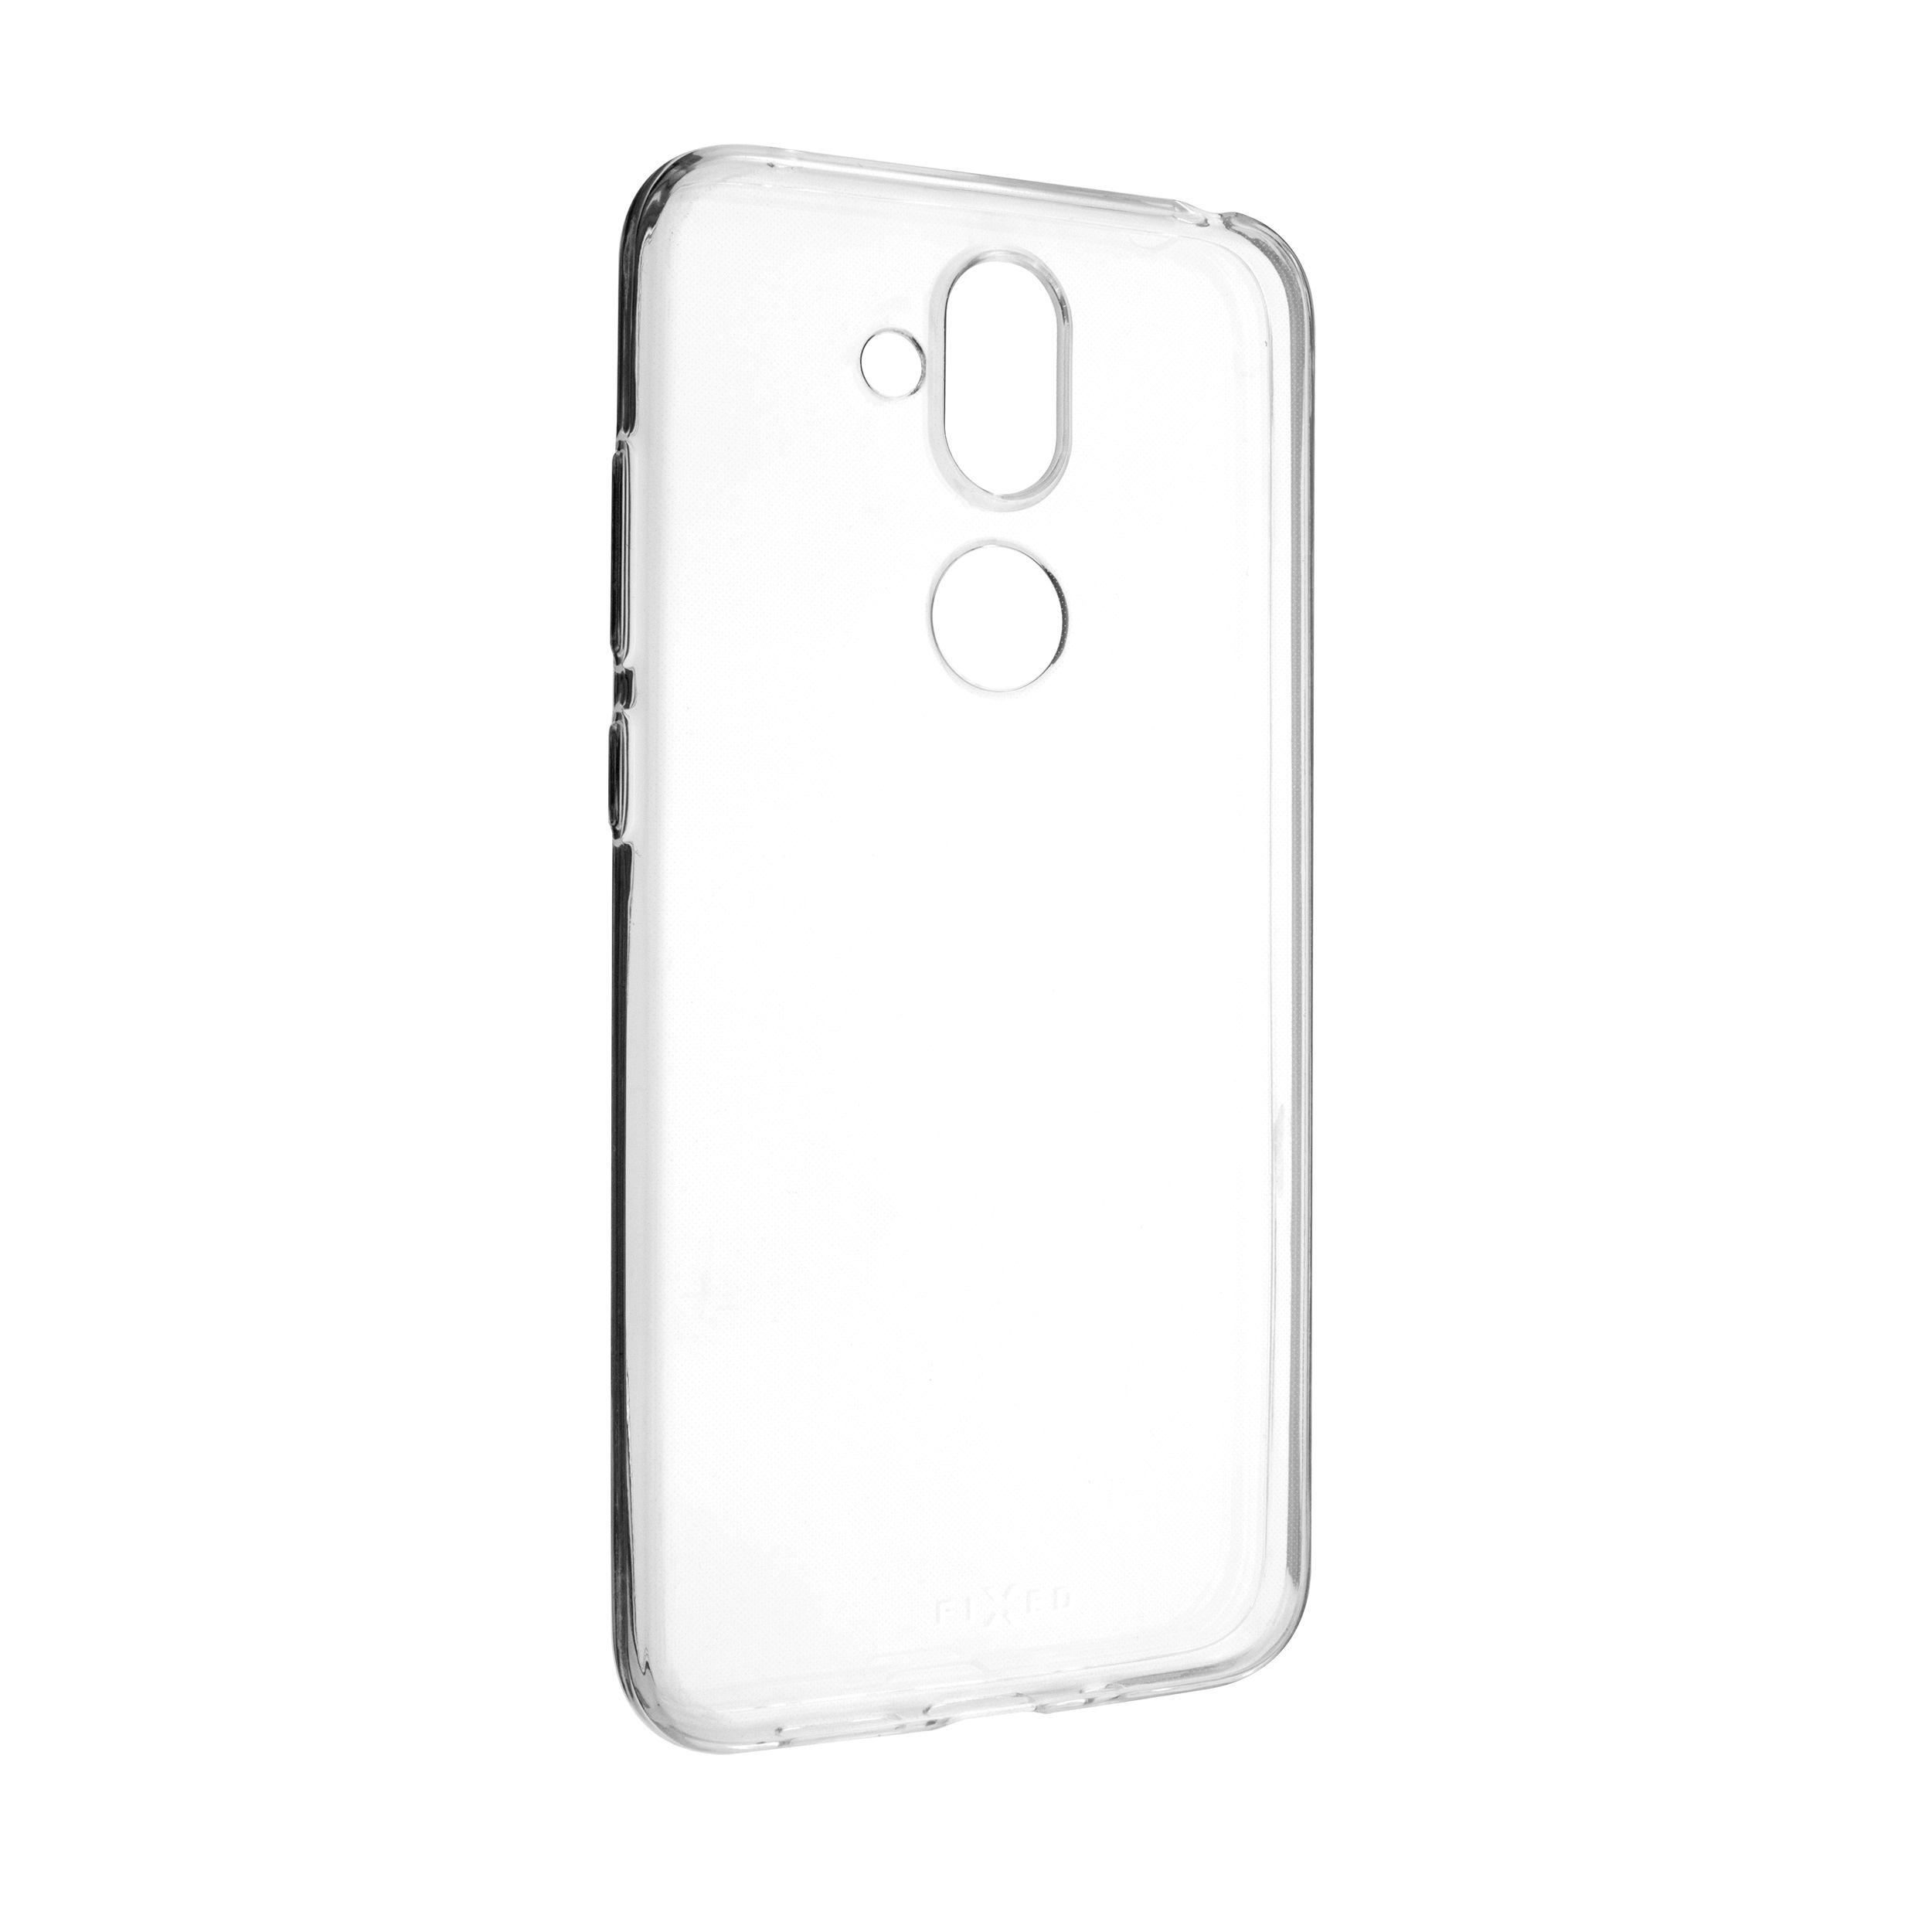 Ultratenké TPU gelové pouzdro FIXED Skin pro Nokia 8.1, 0,6 mm, čiré